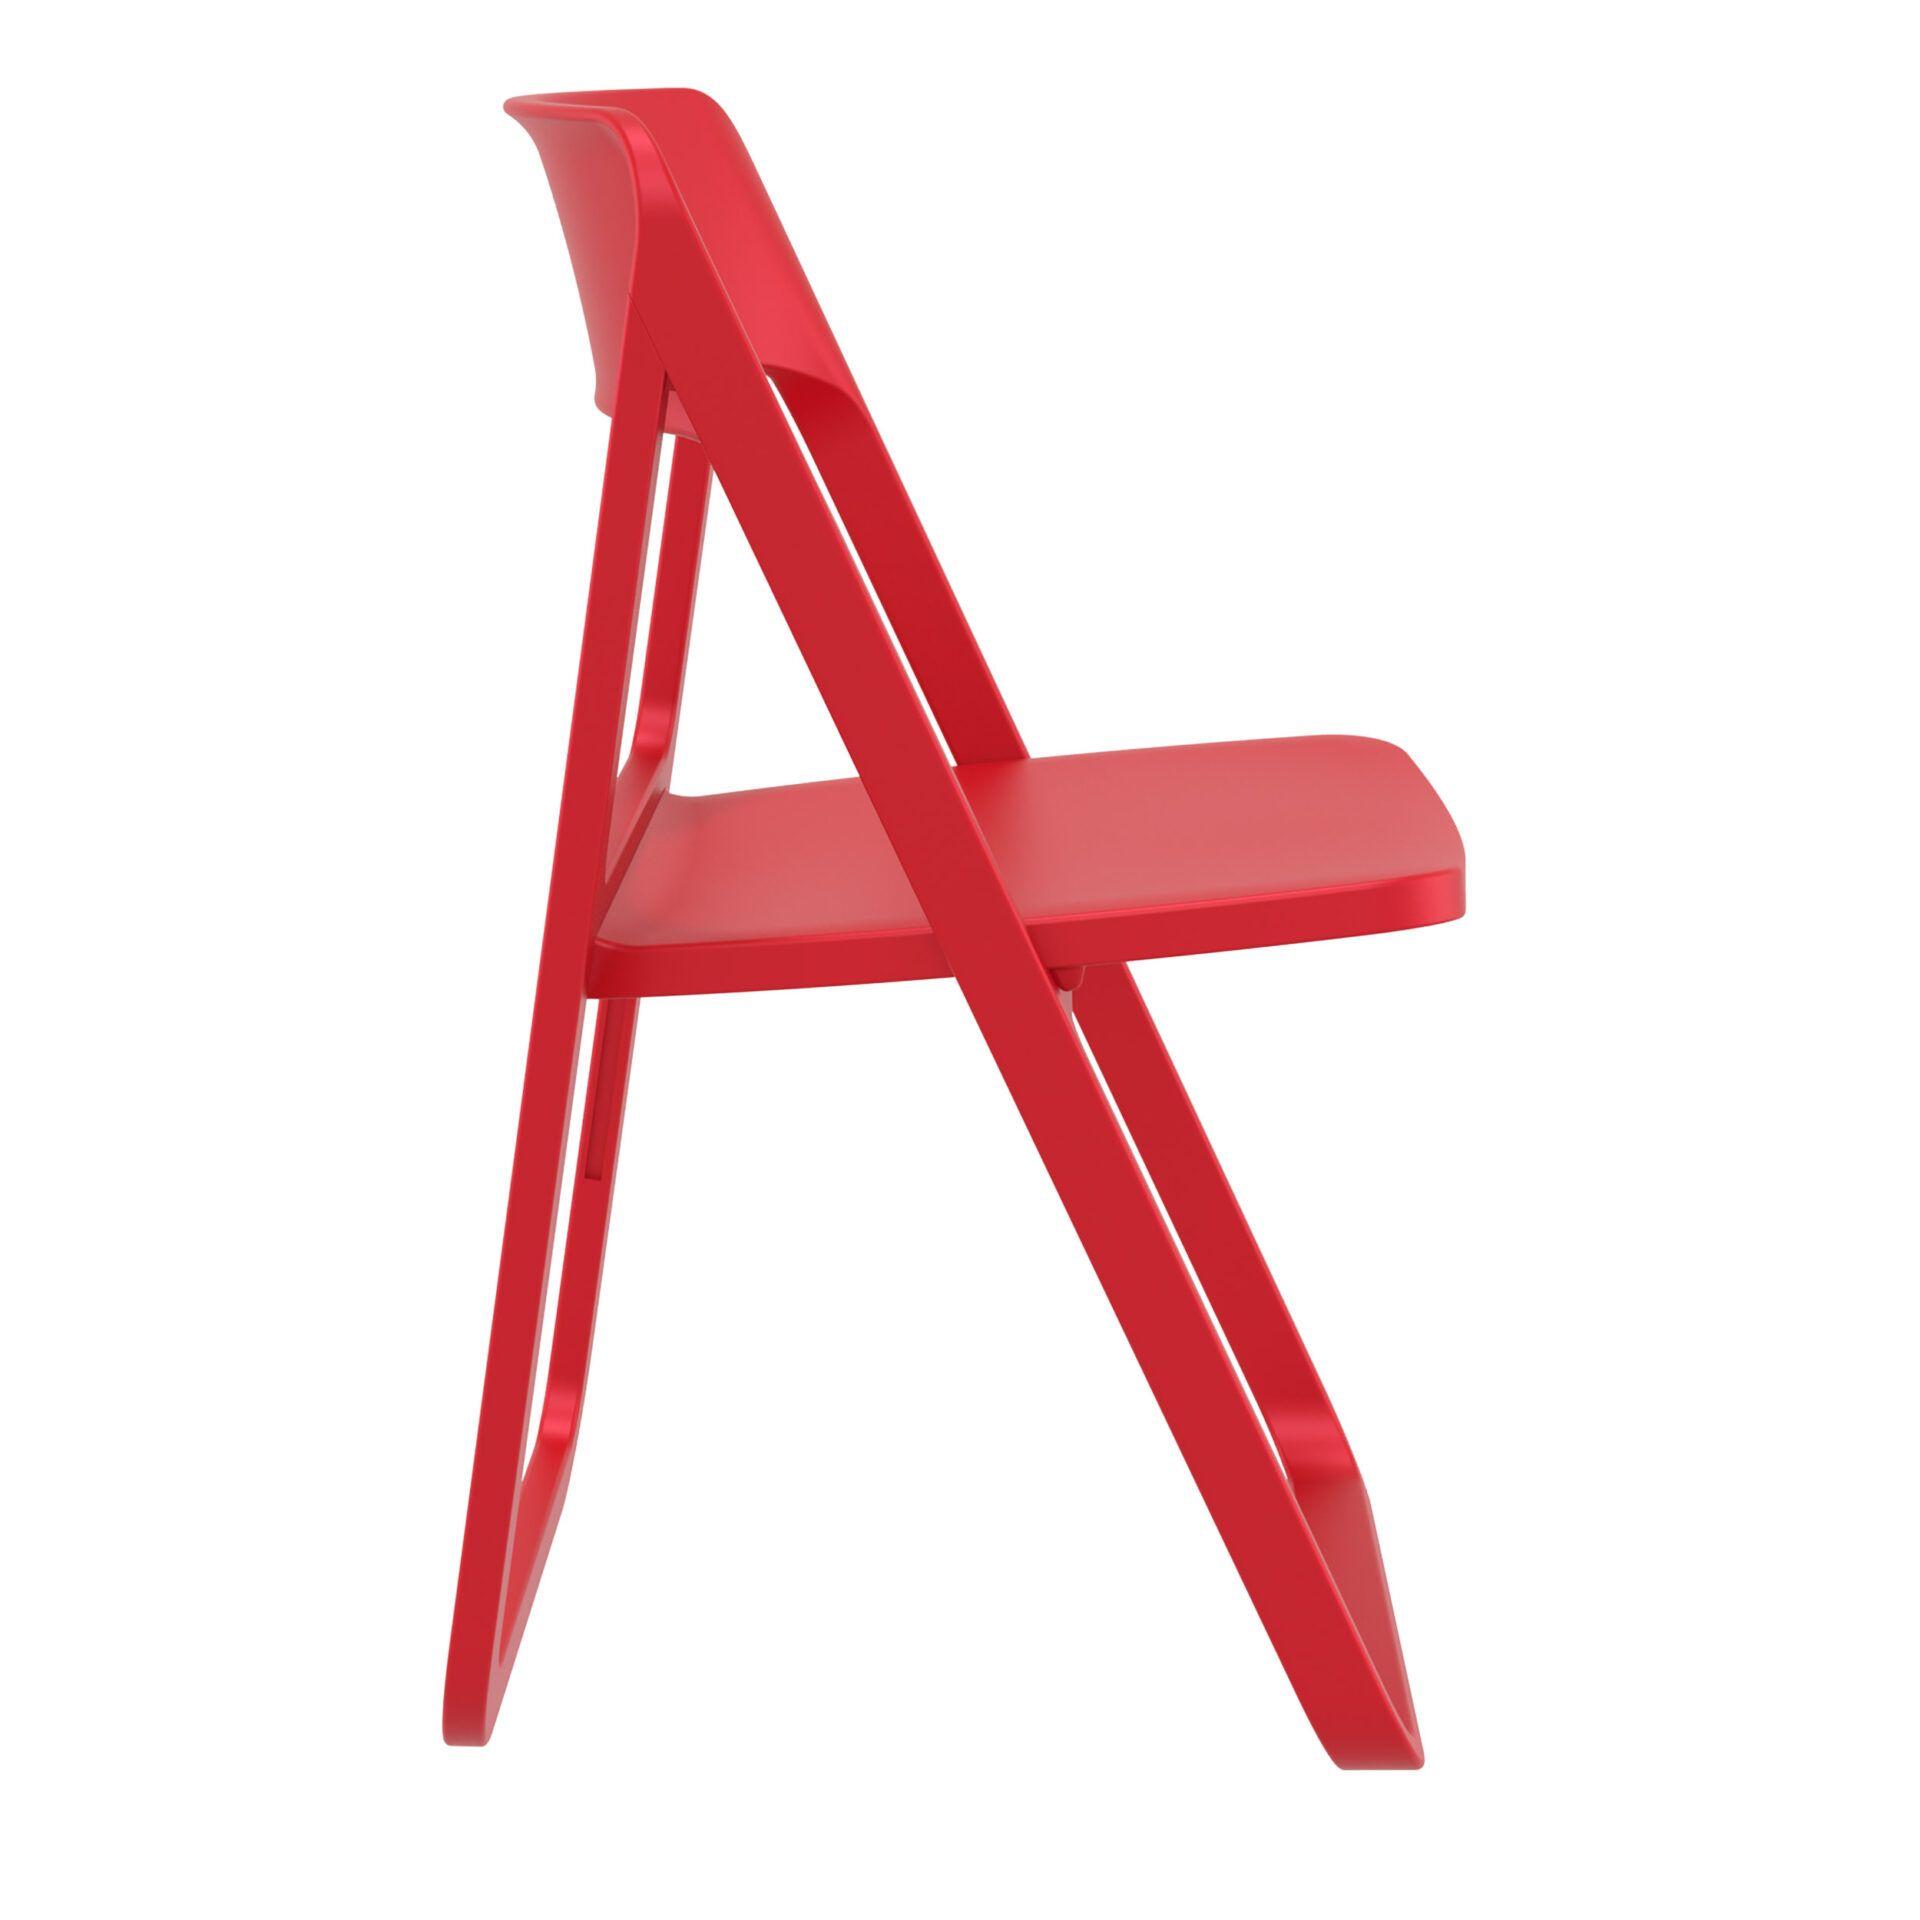 polypropylene dream folding chair red side